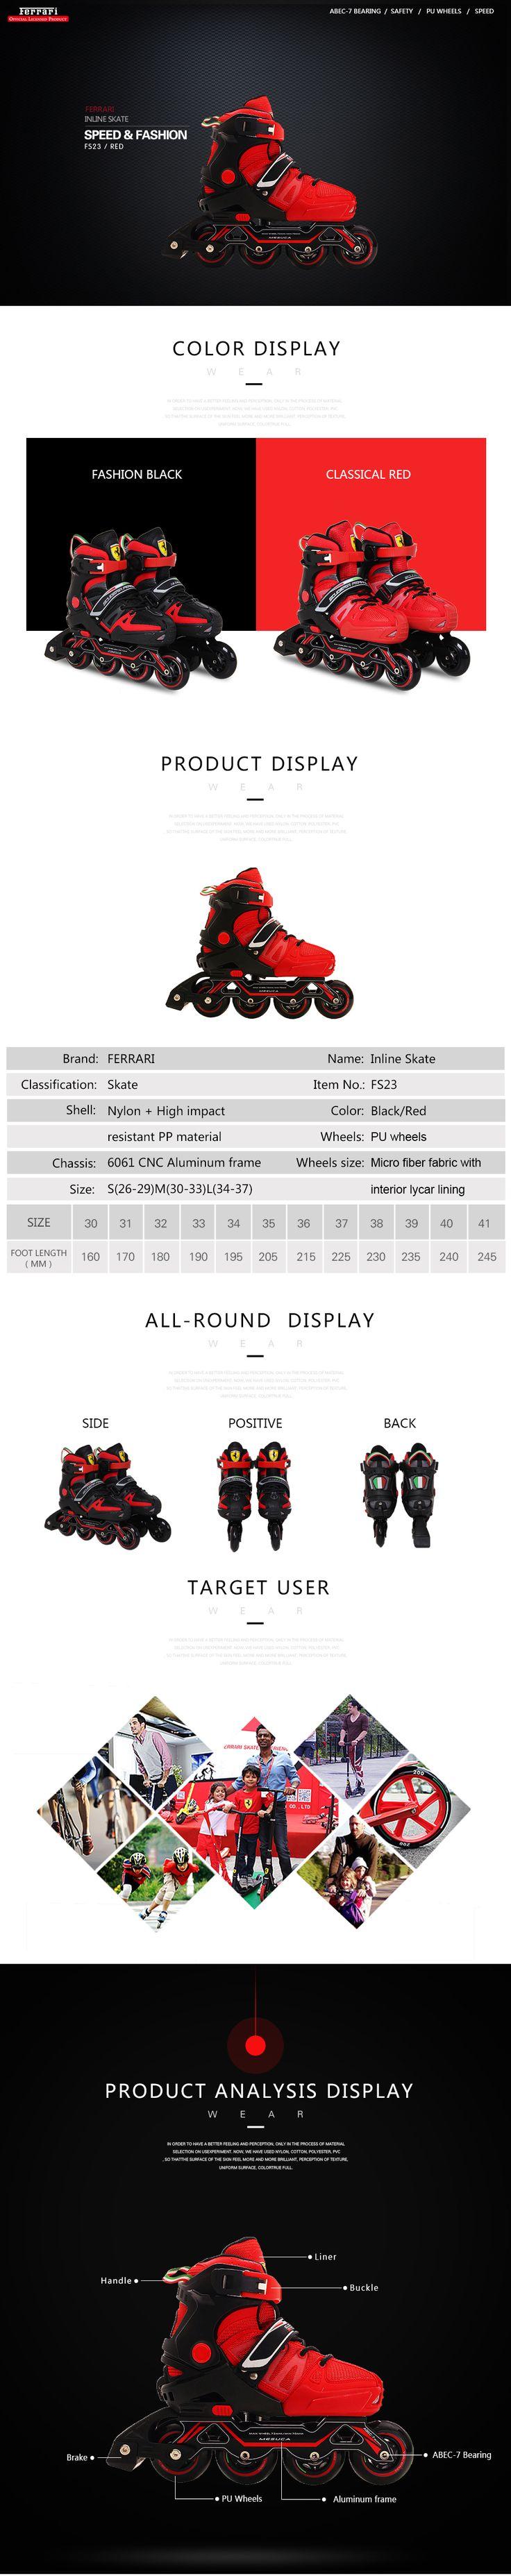 Ferrari FS23 Adjustable Inline Skate 6061 CNC Aluminum Frame Roller Skating High Rebound PU Wheels Sale - Banggood.com